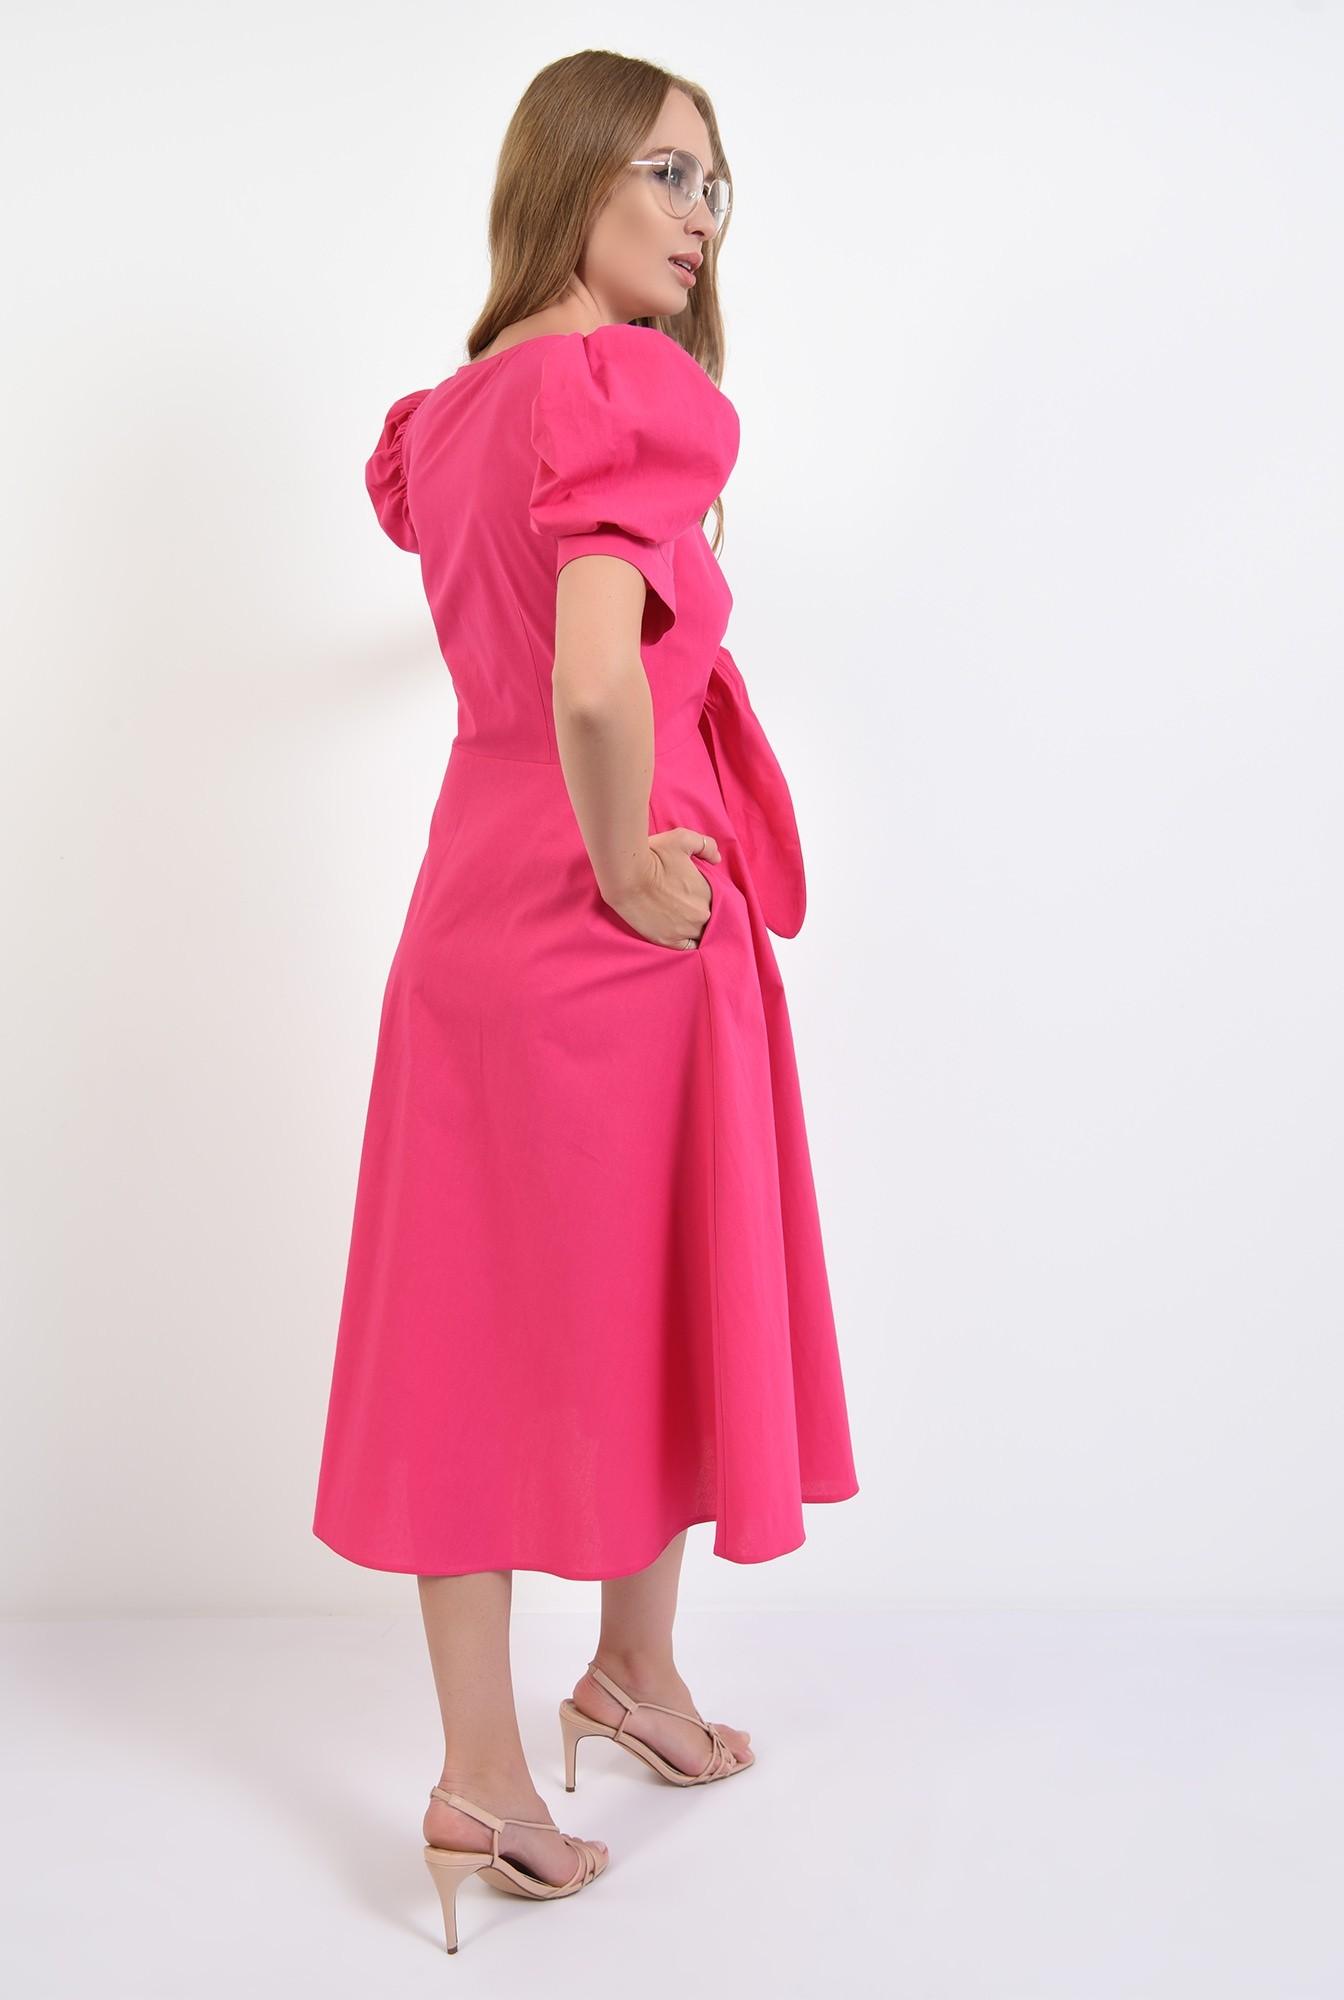 1 - 360 - rochie casual, din poplin, cu nod, decolteu, funda